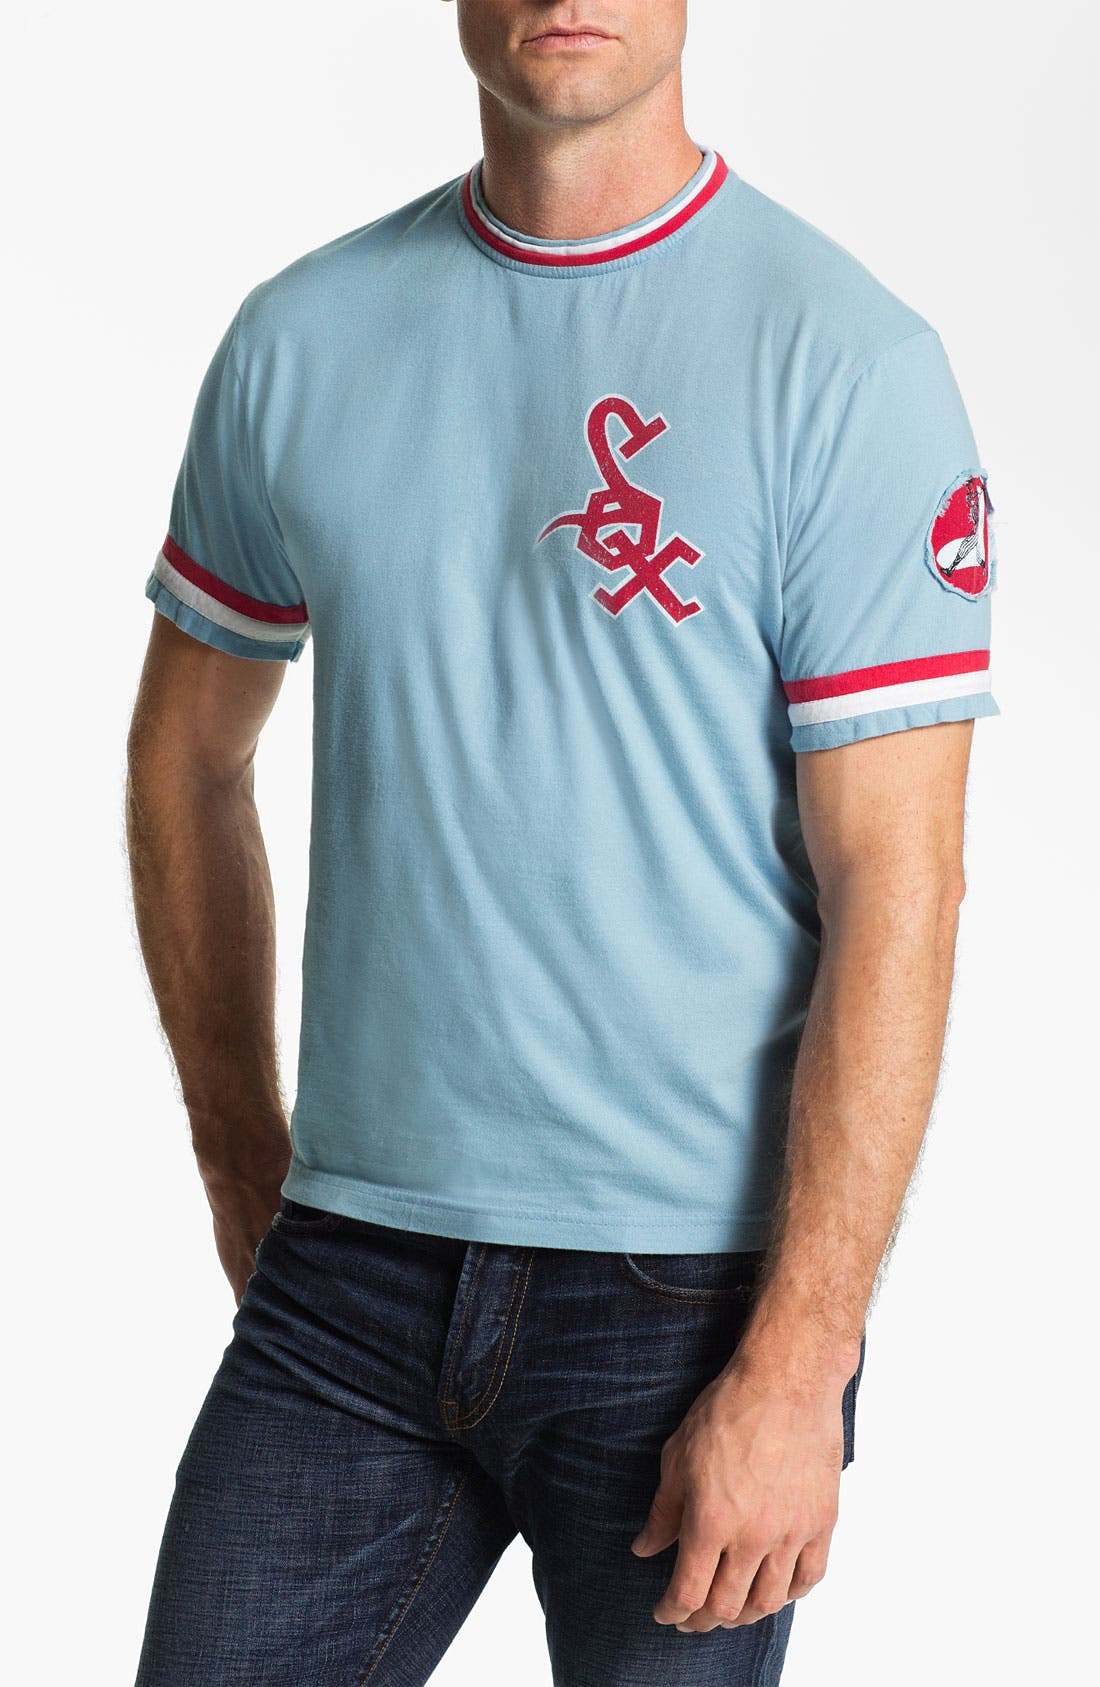 Alternate Image 1 Selected - Red Jacket 'Chicago White Sox' Ringer Trim Fit T-Shirt (Men)